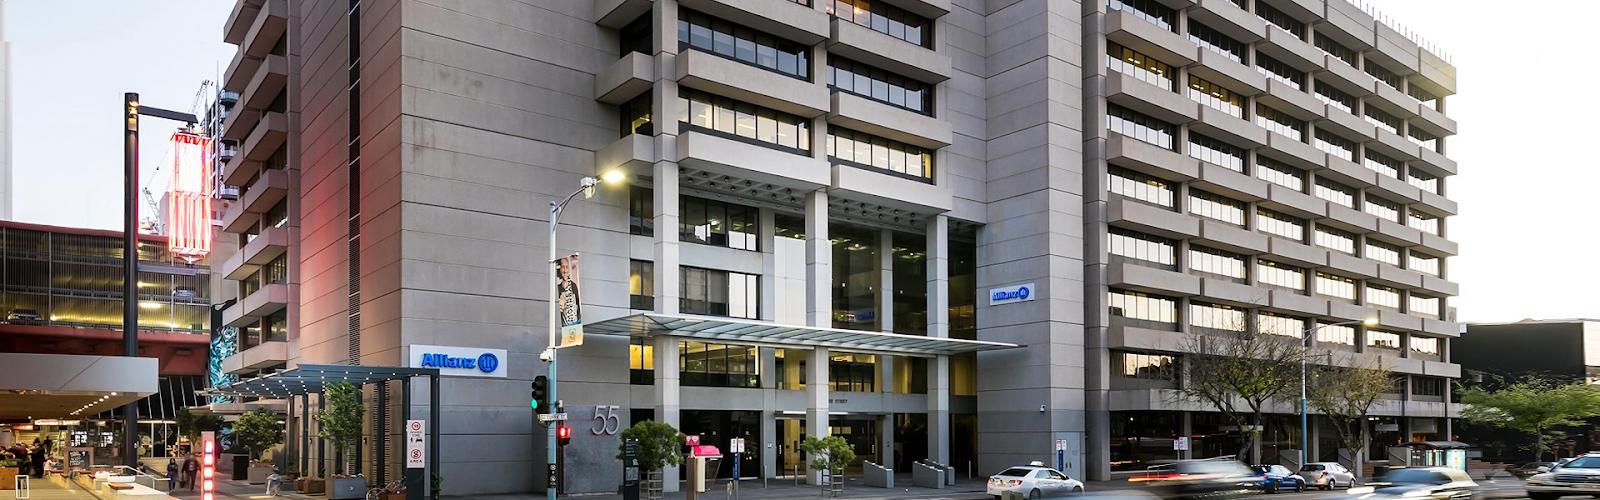 Suntec REIT - Australia Property, 55 Currie Street